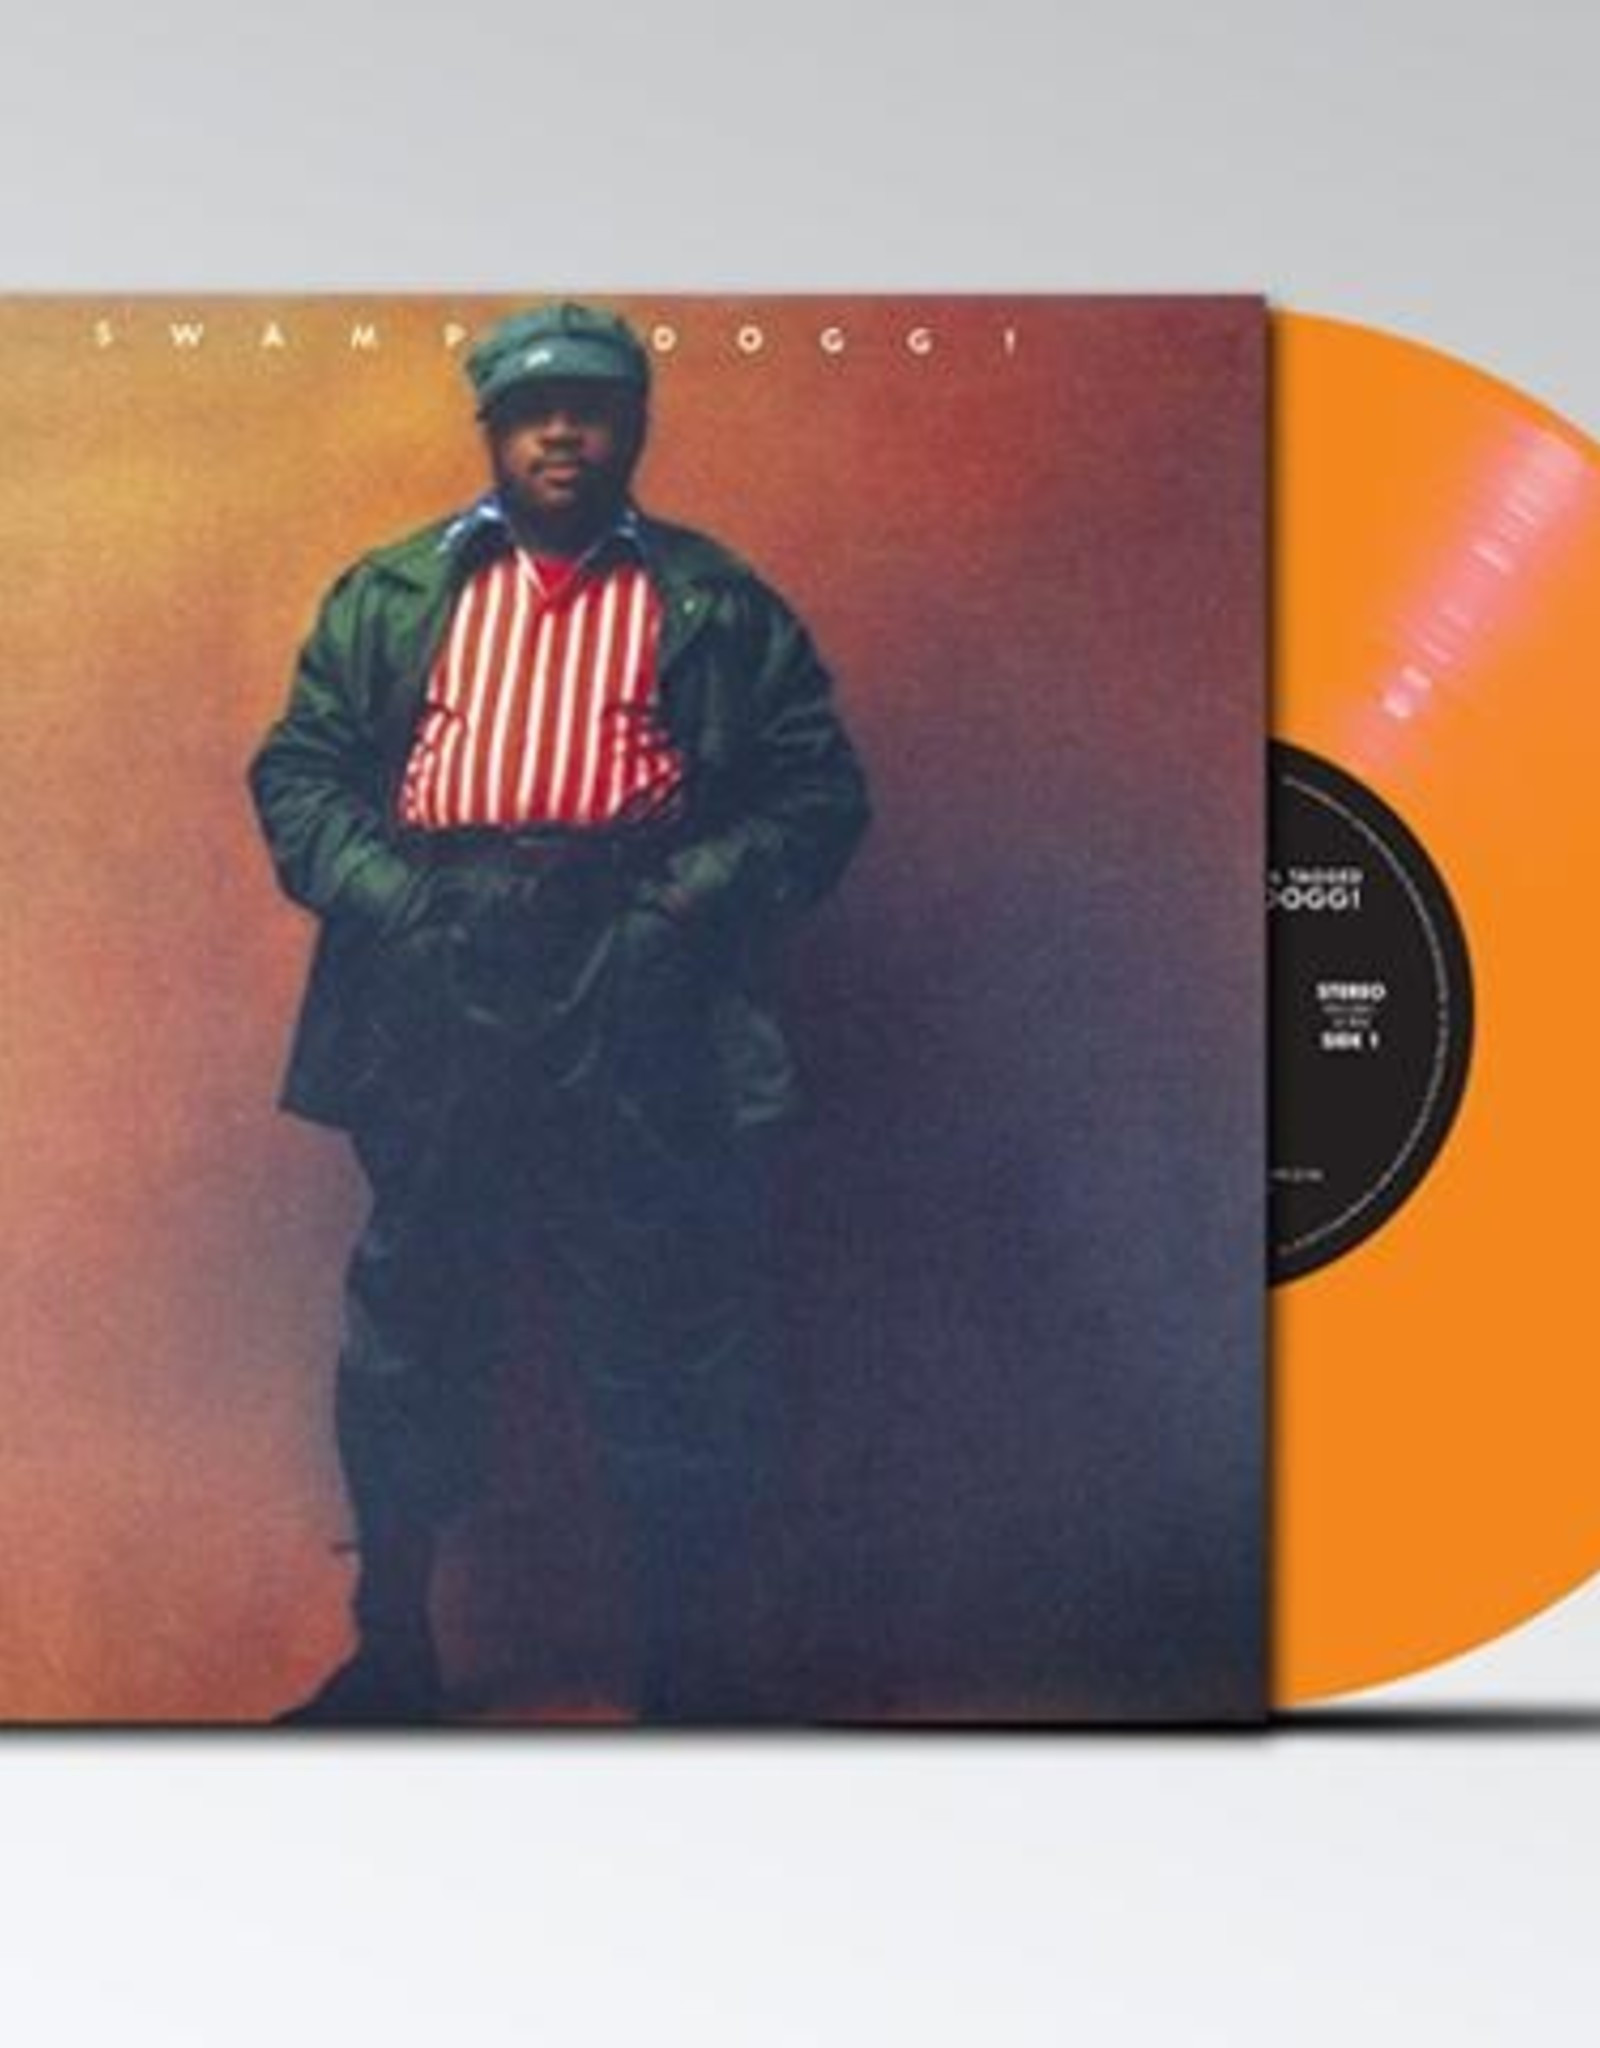 Swamp Dogg - Cuffed, Collared & Tagged (Tangerine Vinyl)